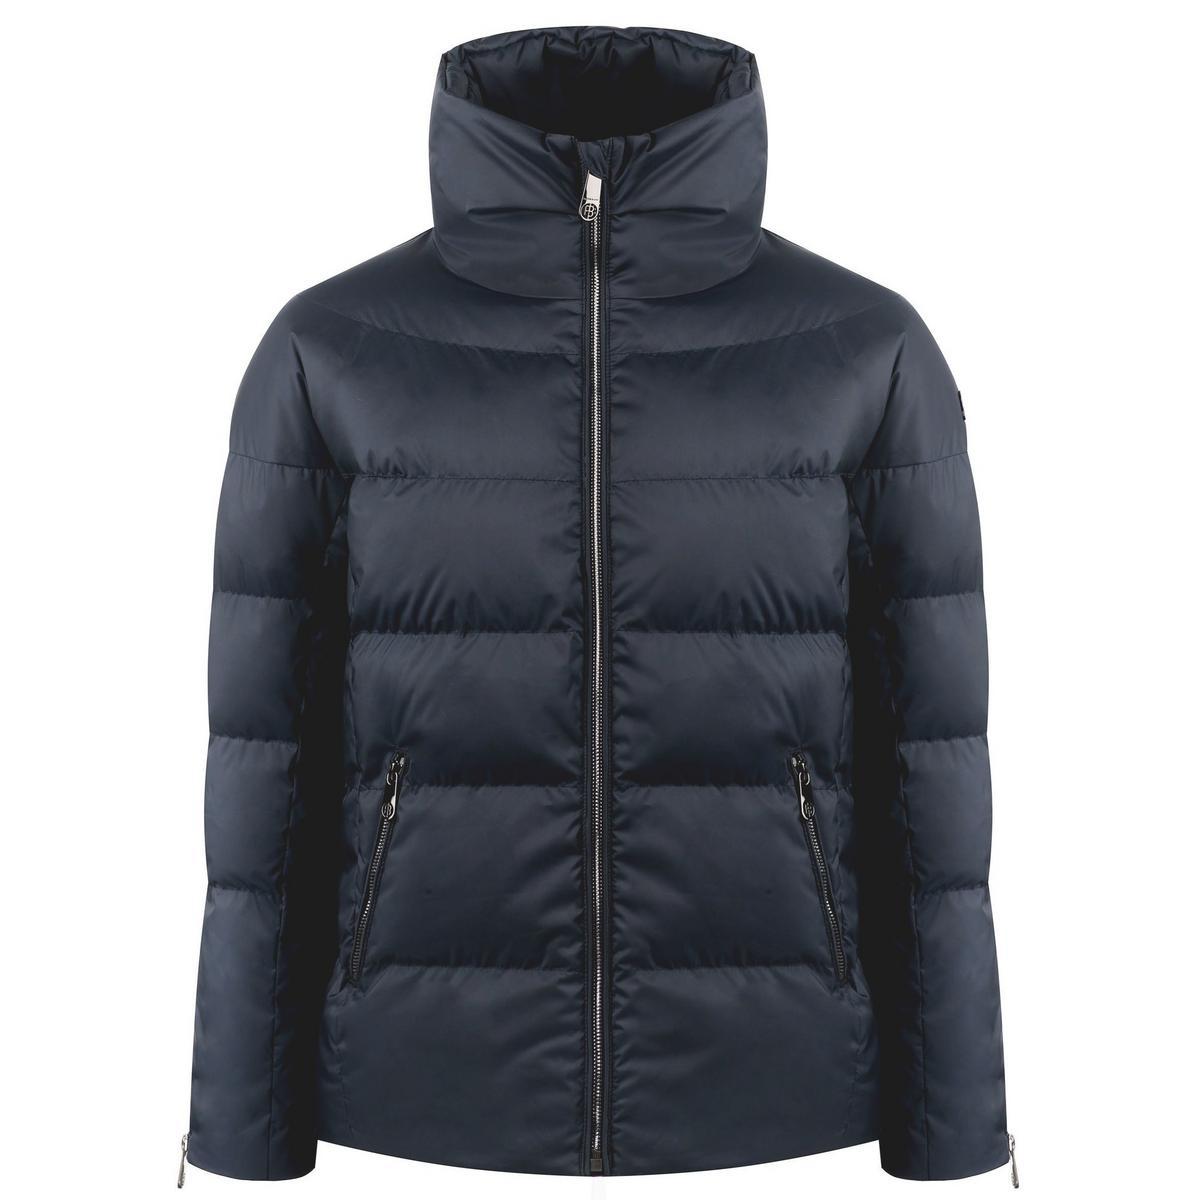 Poivre Blanc Women's Heat Generative Synthetic Down Jacket - Gothic Blue